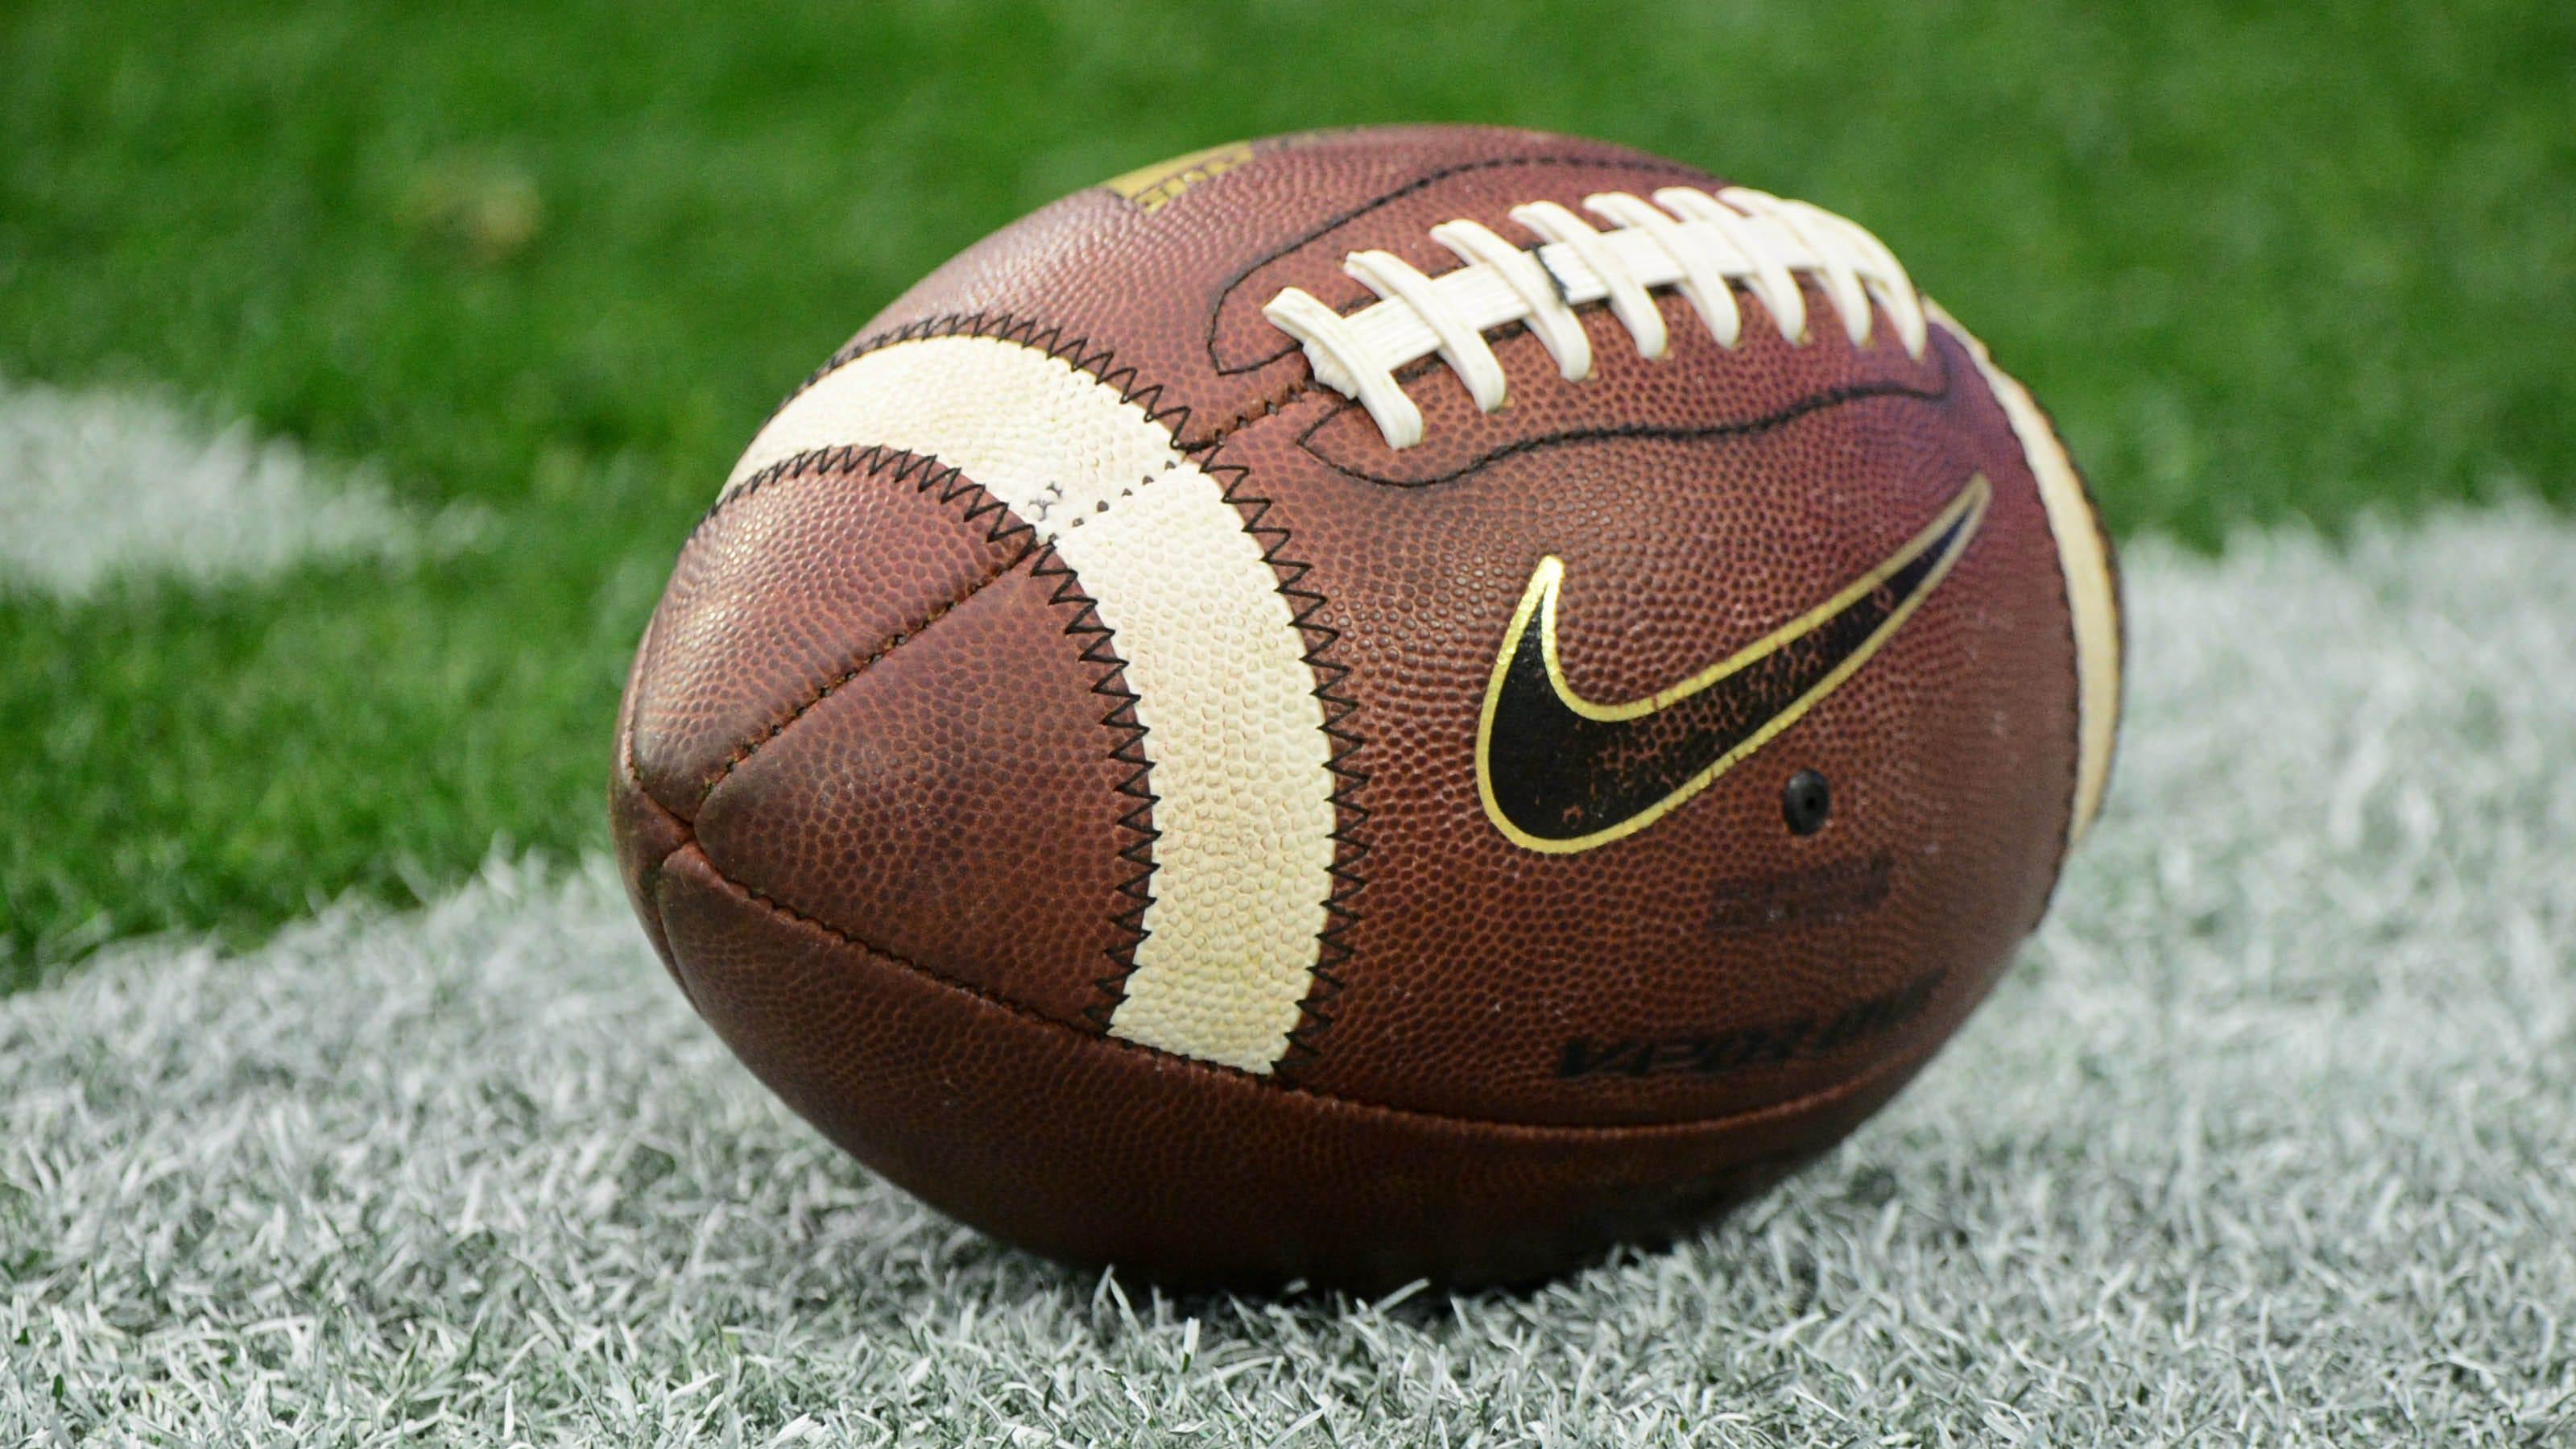 5d63570b 11f8 41d8 9b4a 35545ec2a9f0 USP NCAA Football  Fiesta Bowl Penn State vs Washi x JPG?crop=3199,1799,x0,y160&width=3199&height=1799&format=pjpg&auto=webp.'